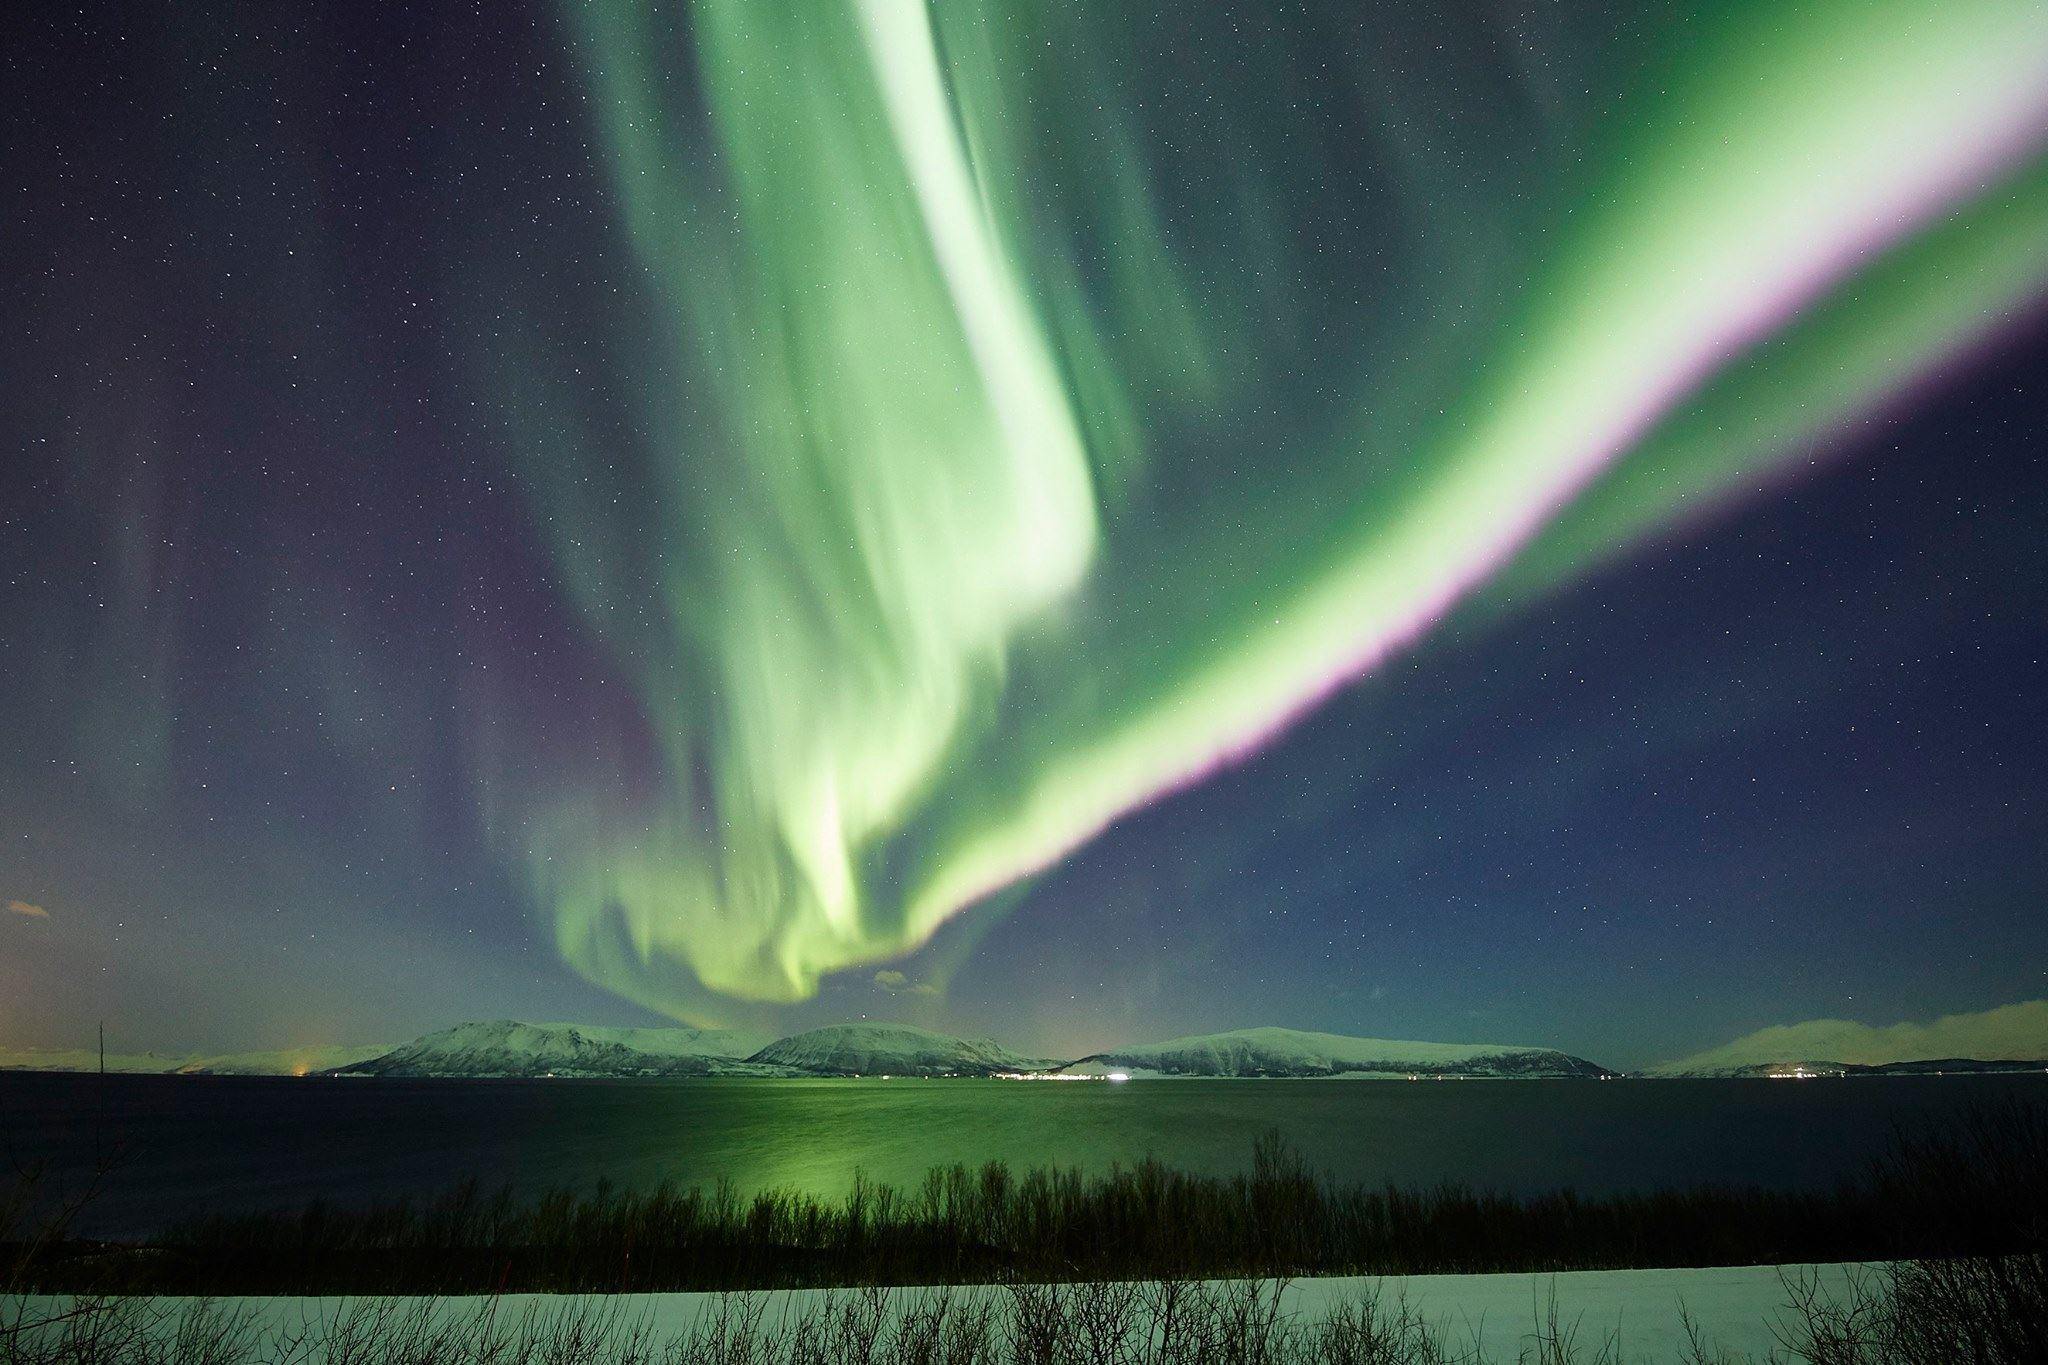 Nordlys fototur fra Tromsø - Green Gold of Norway